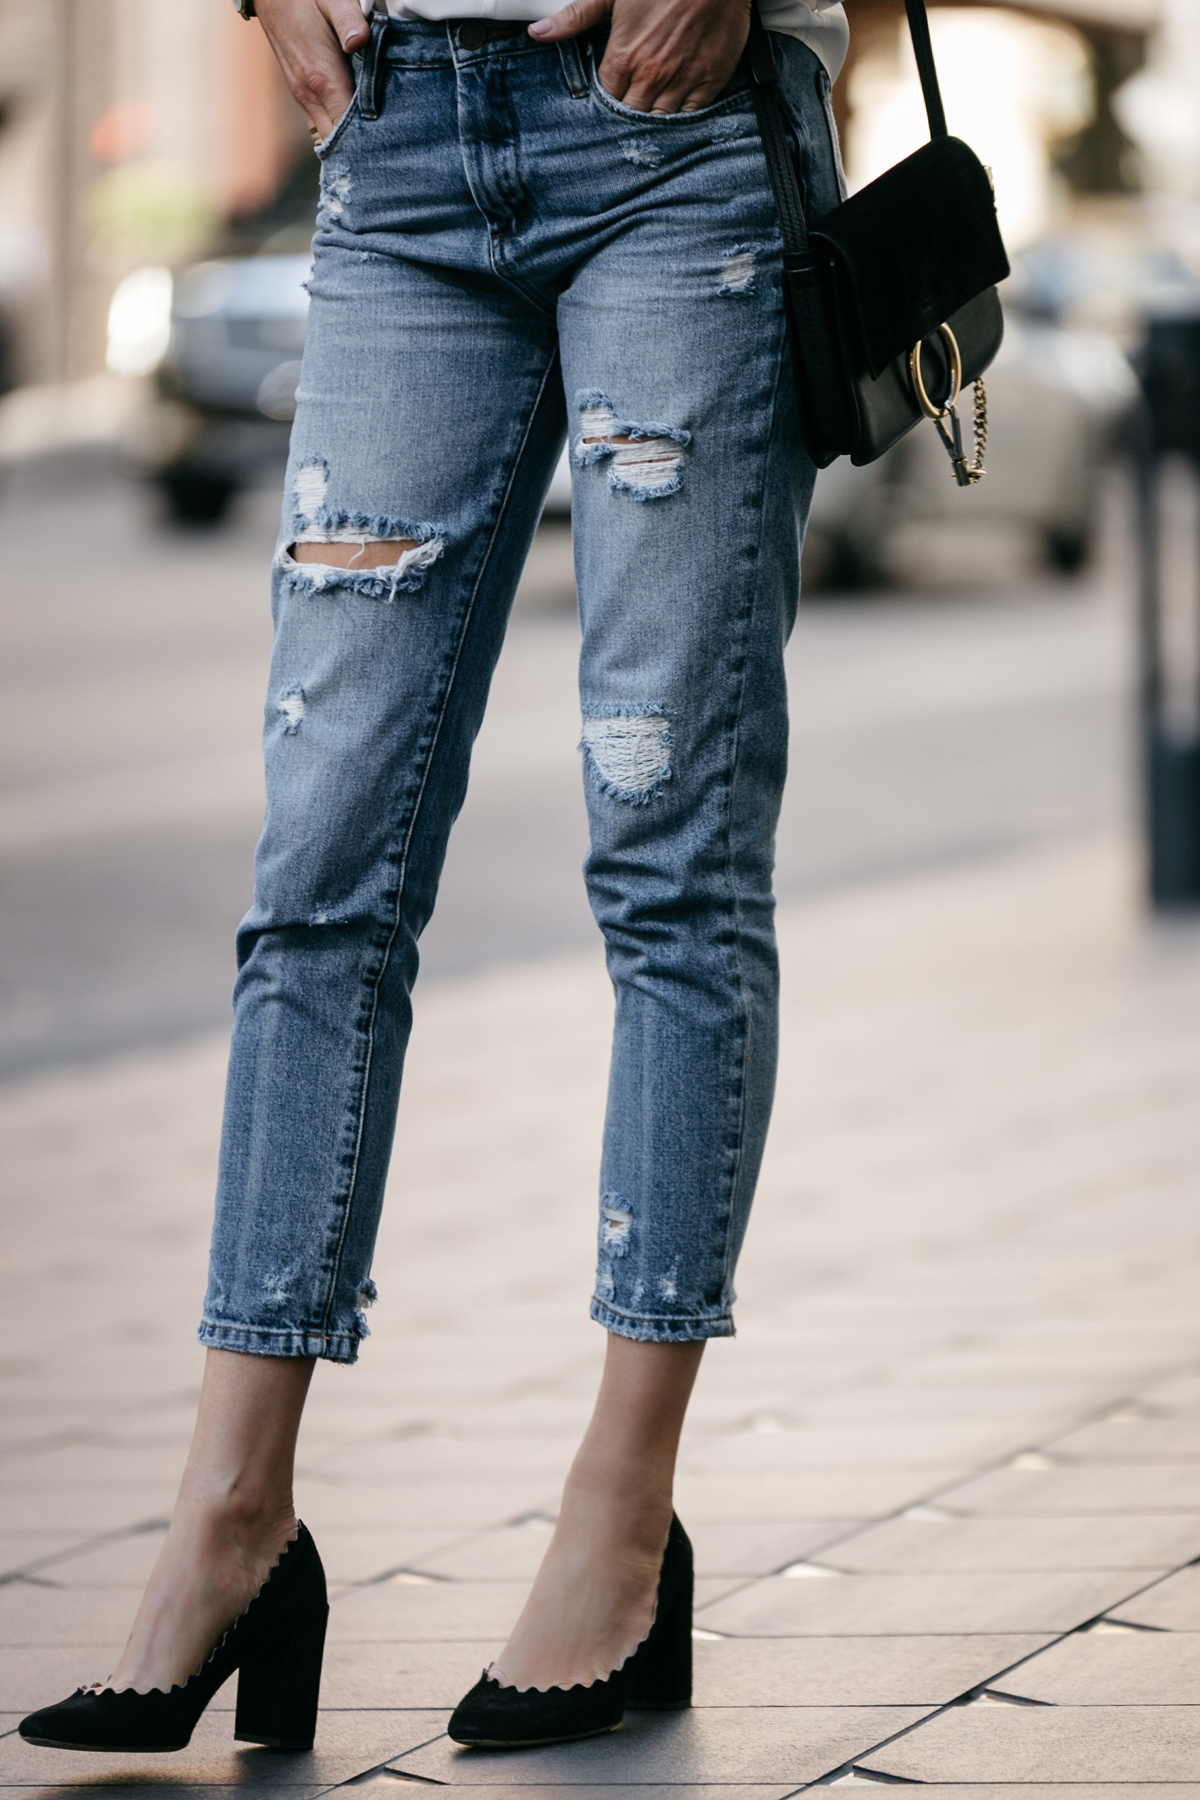 Fashion Jackson, Dallas Blogger, Fashion Blogger, Street Style, BlankNYC Ripped Denim Mom Jeans, Chloe Lauren Scalloped Pumps, Chloe Faye Handbag